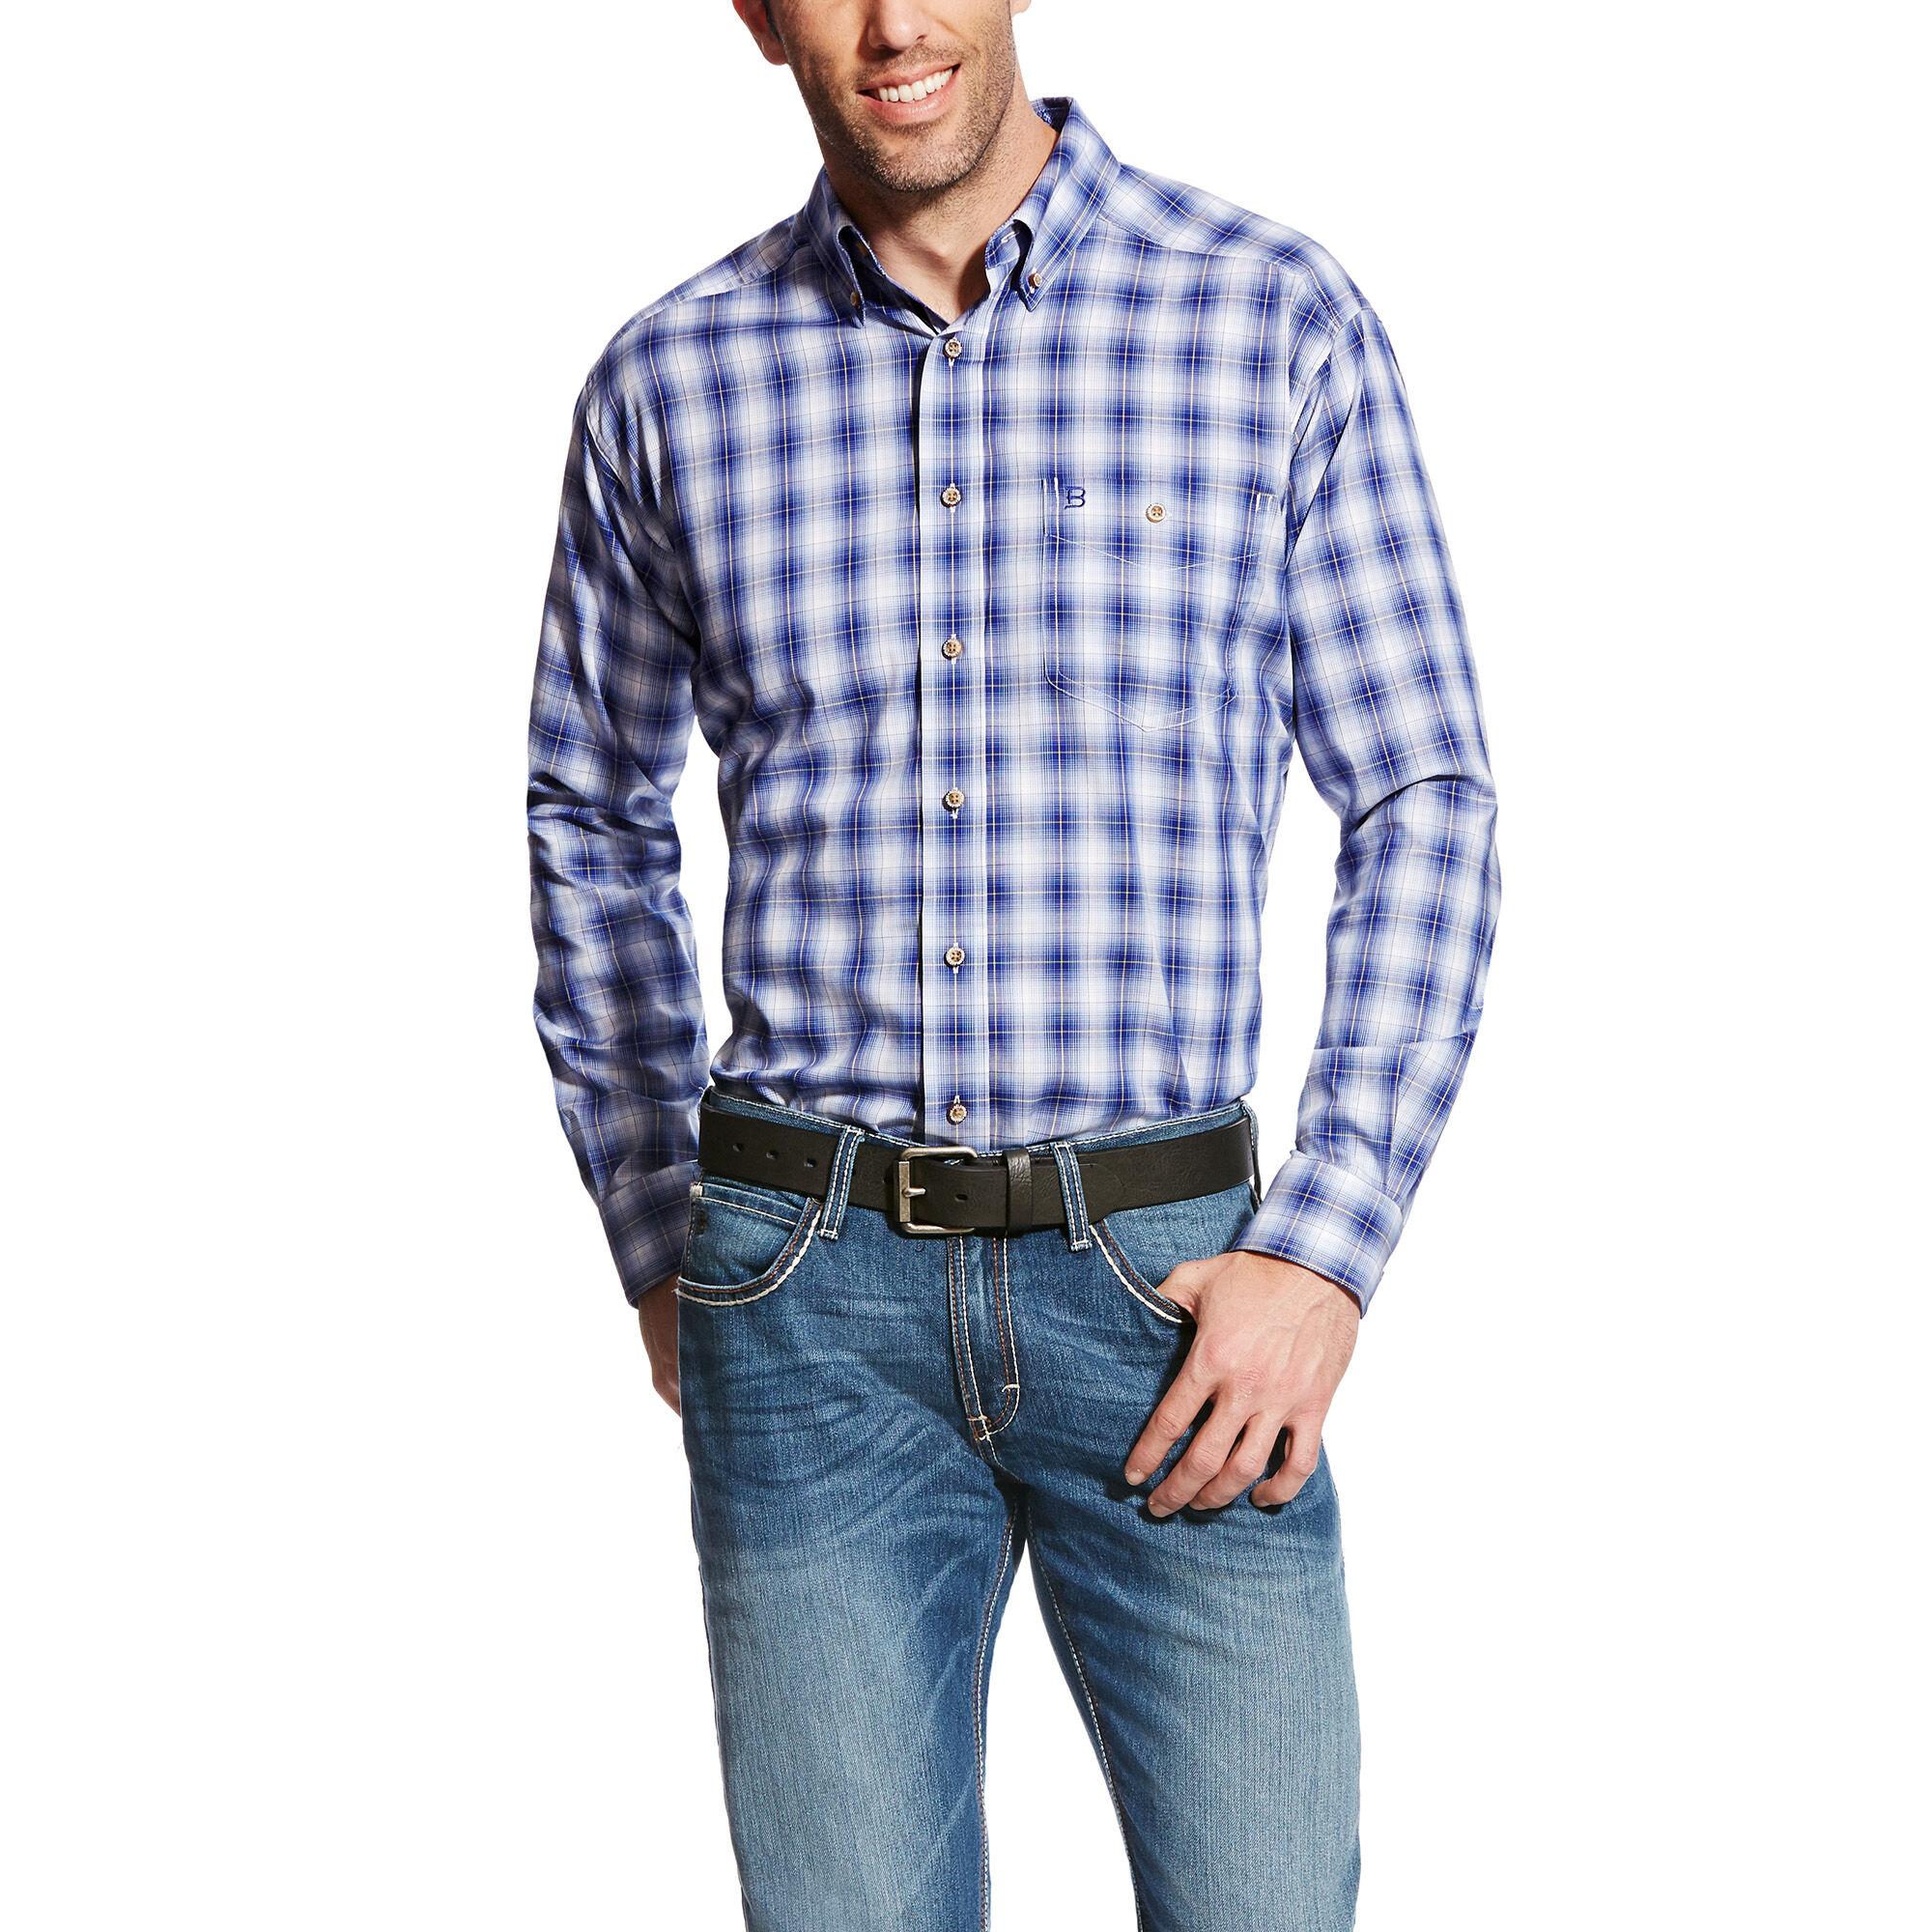 Relentless Unbreakable Shirt